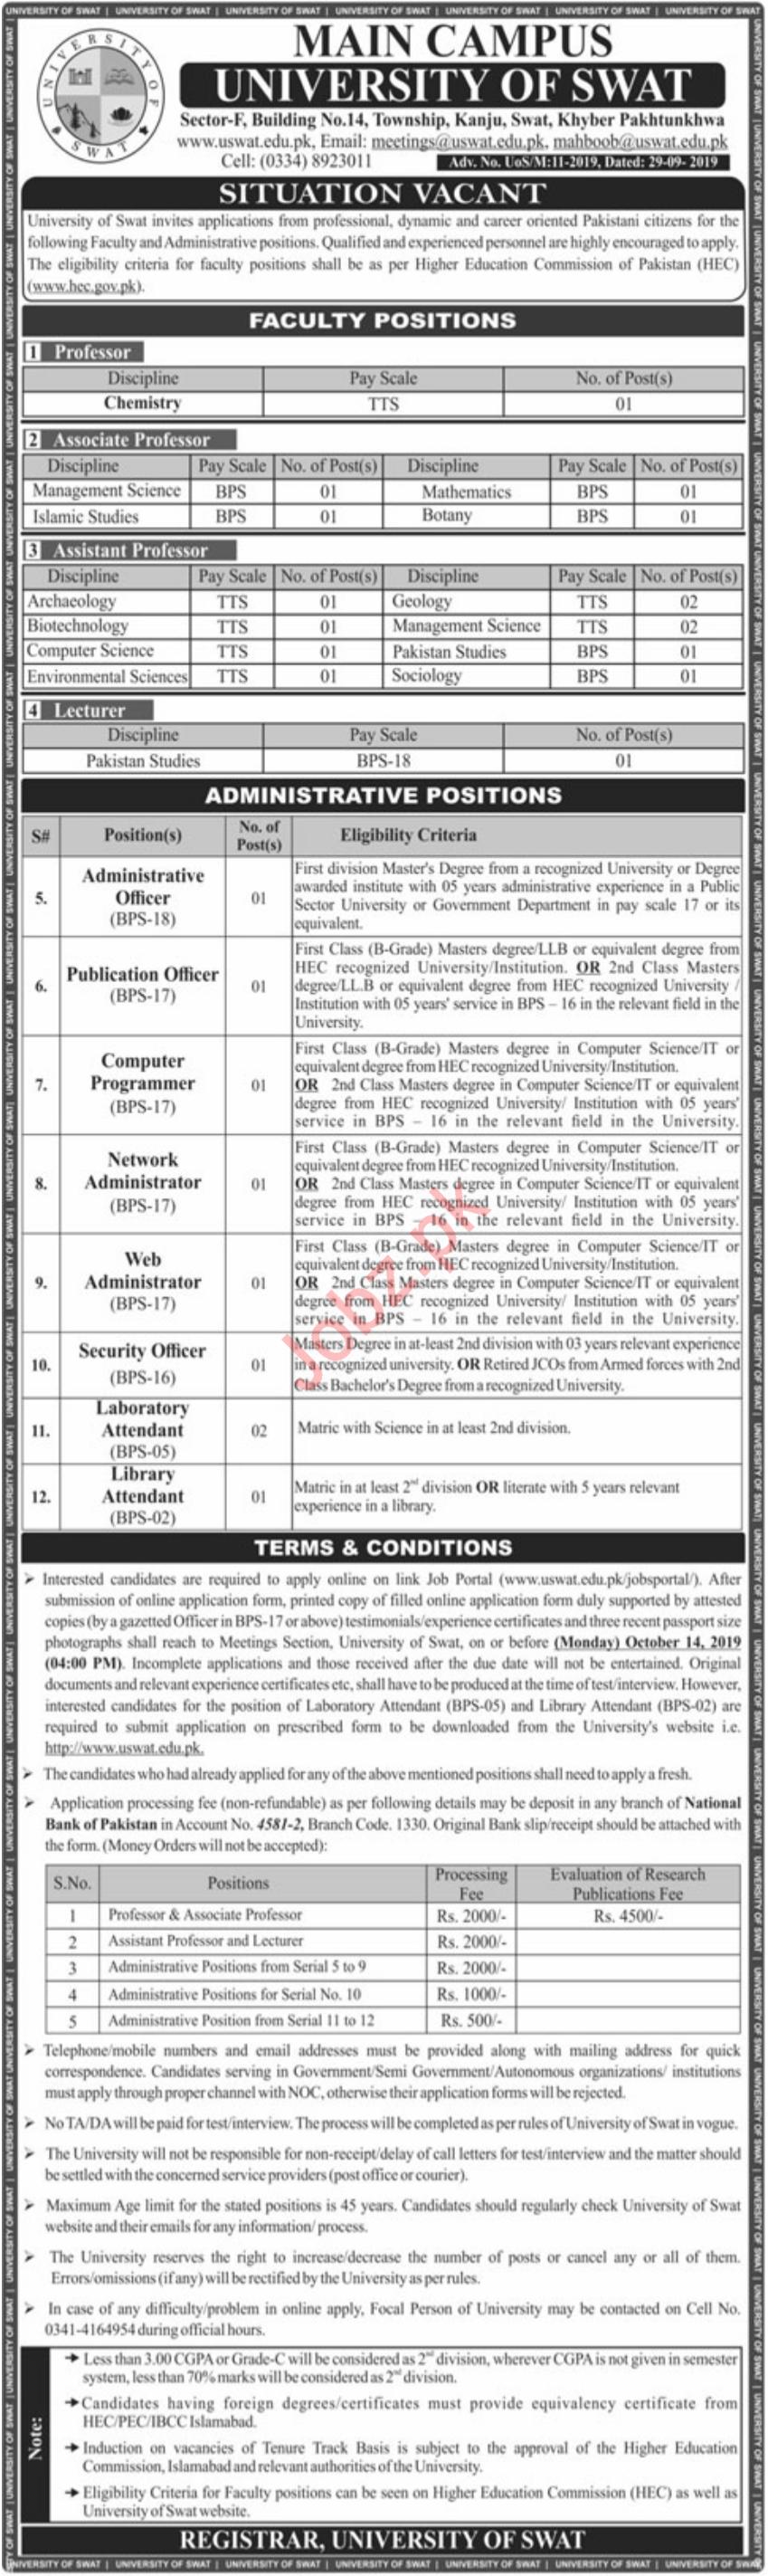 University Of Swat Main Campus Jobs 2019